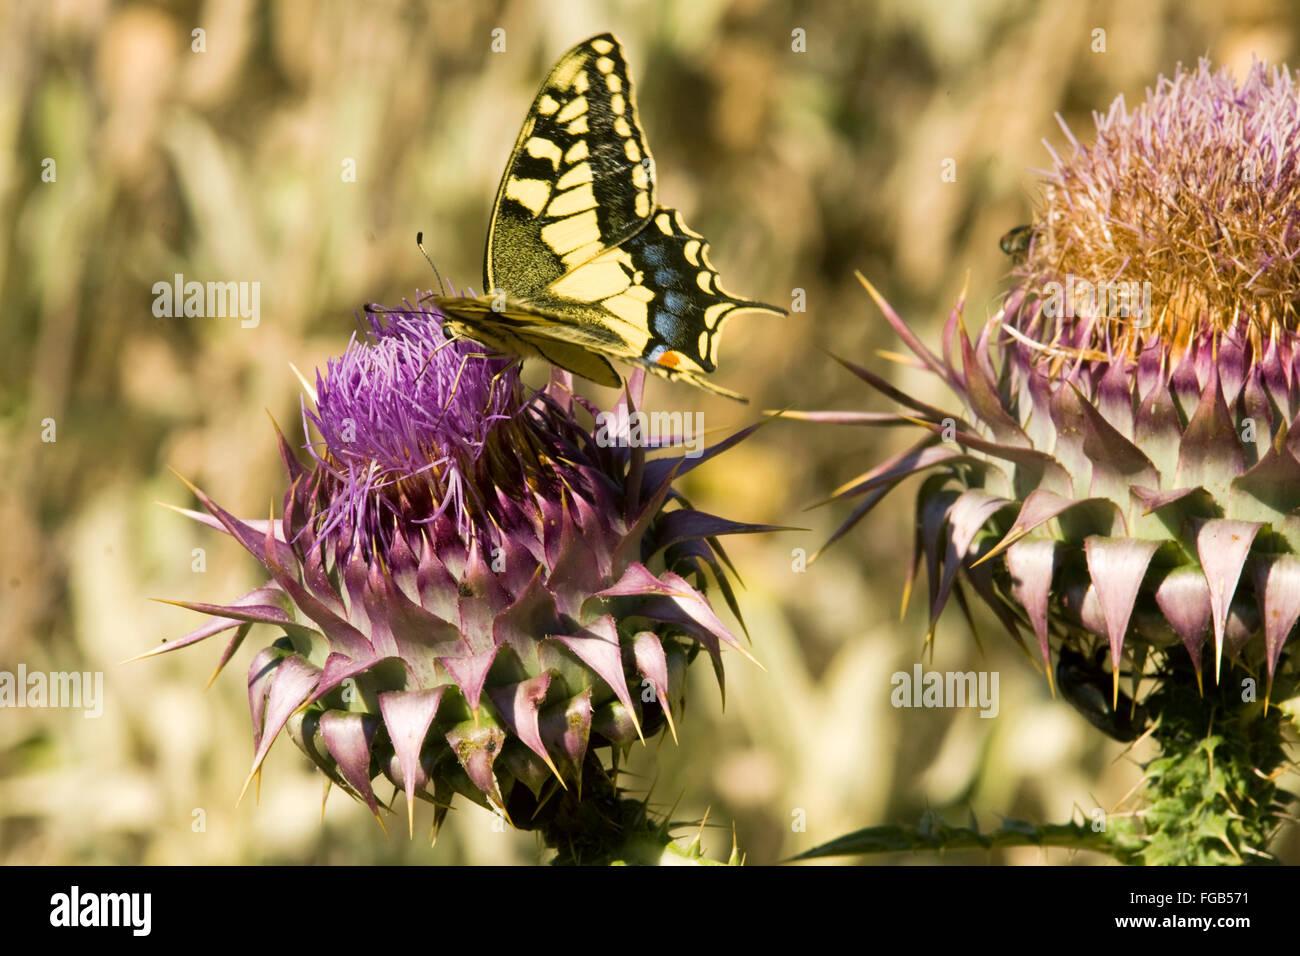 Griechenland, Kreta, bei Kissamos, Polyrrinia, Schmetteling auf Distelblüte. - Stock Image